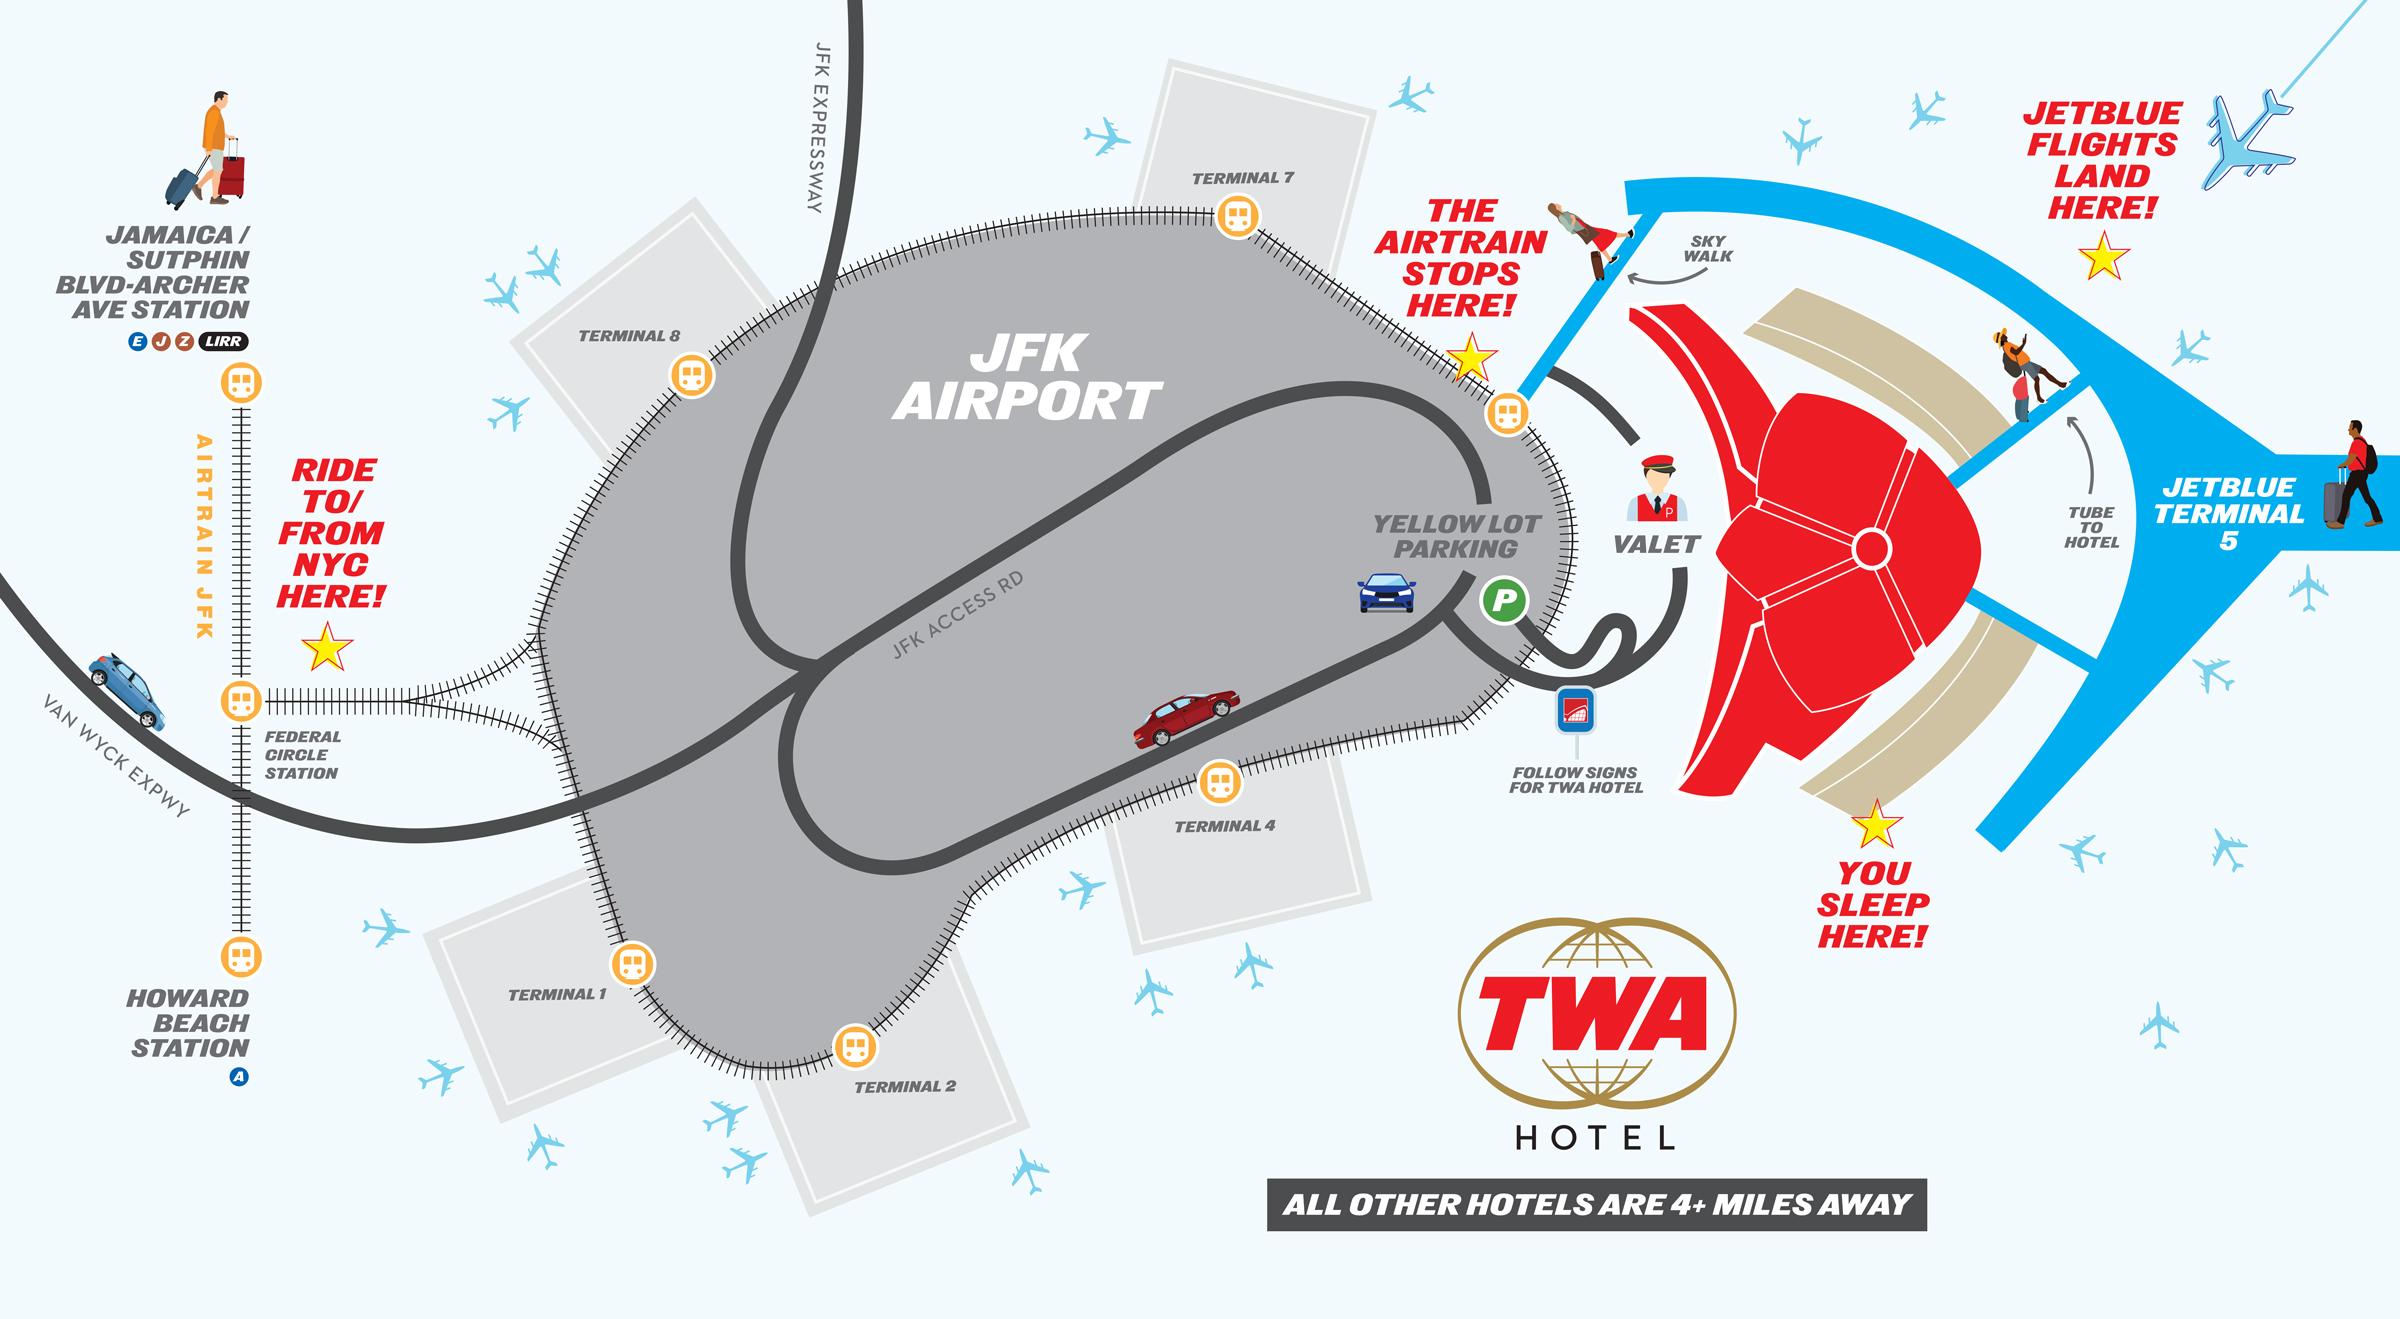 TWA Hotel | Directions